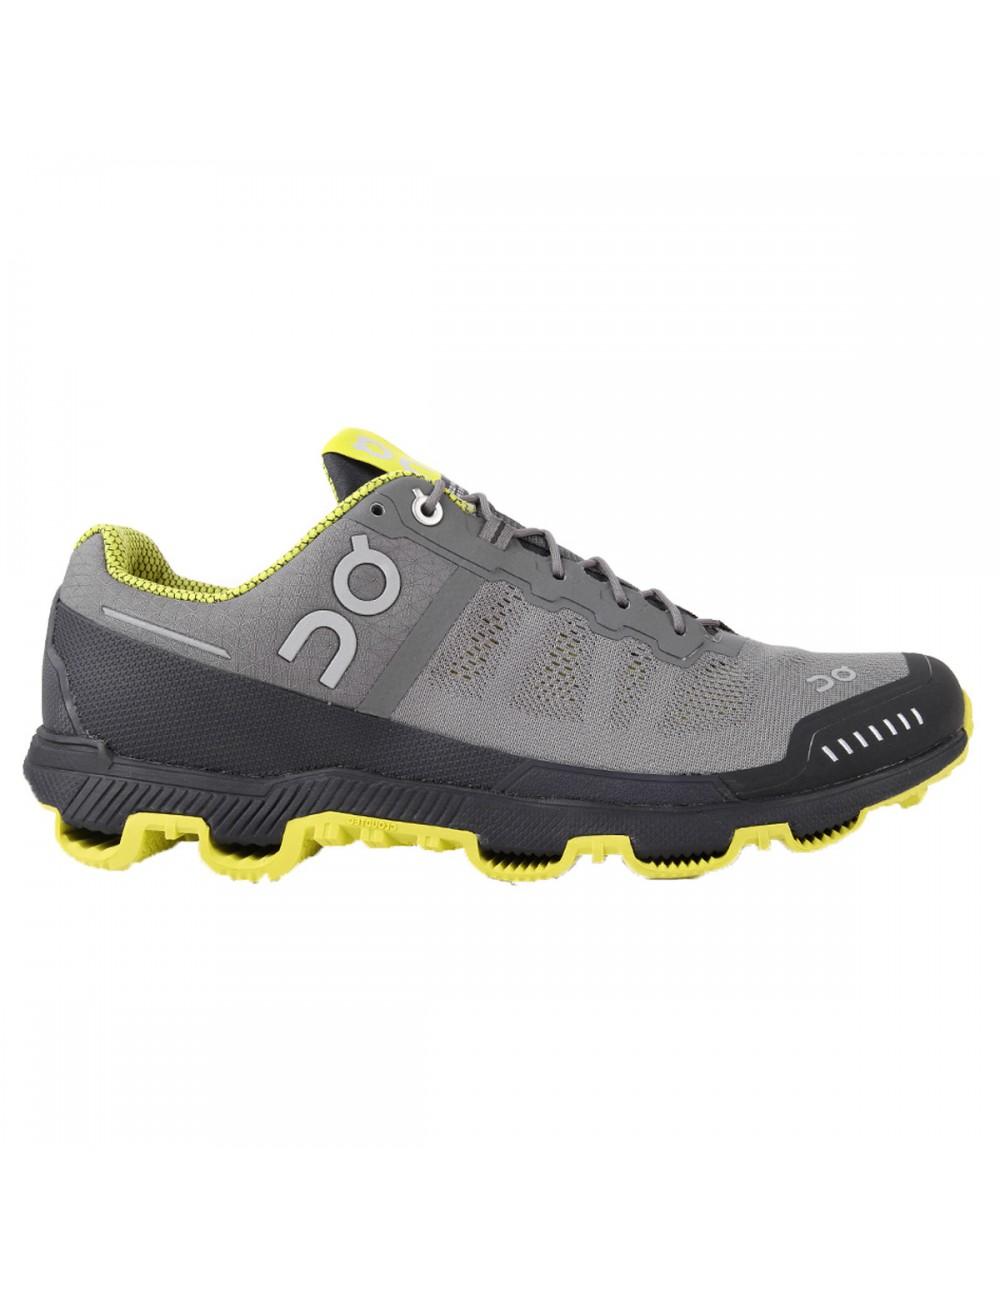 ON Cloudventure Shoe - Grey/Sulphur_10992